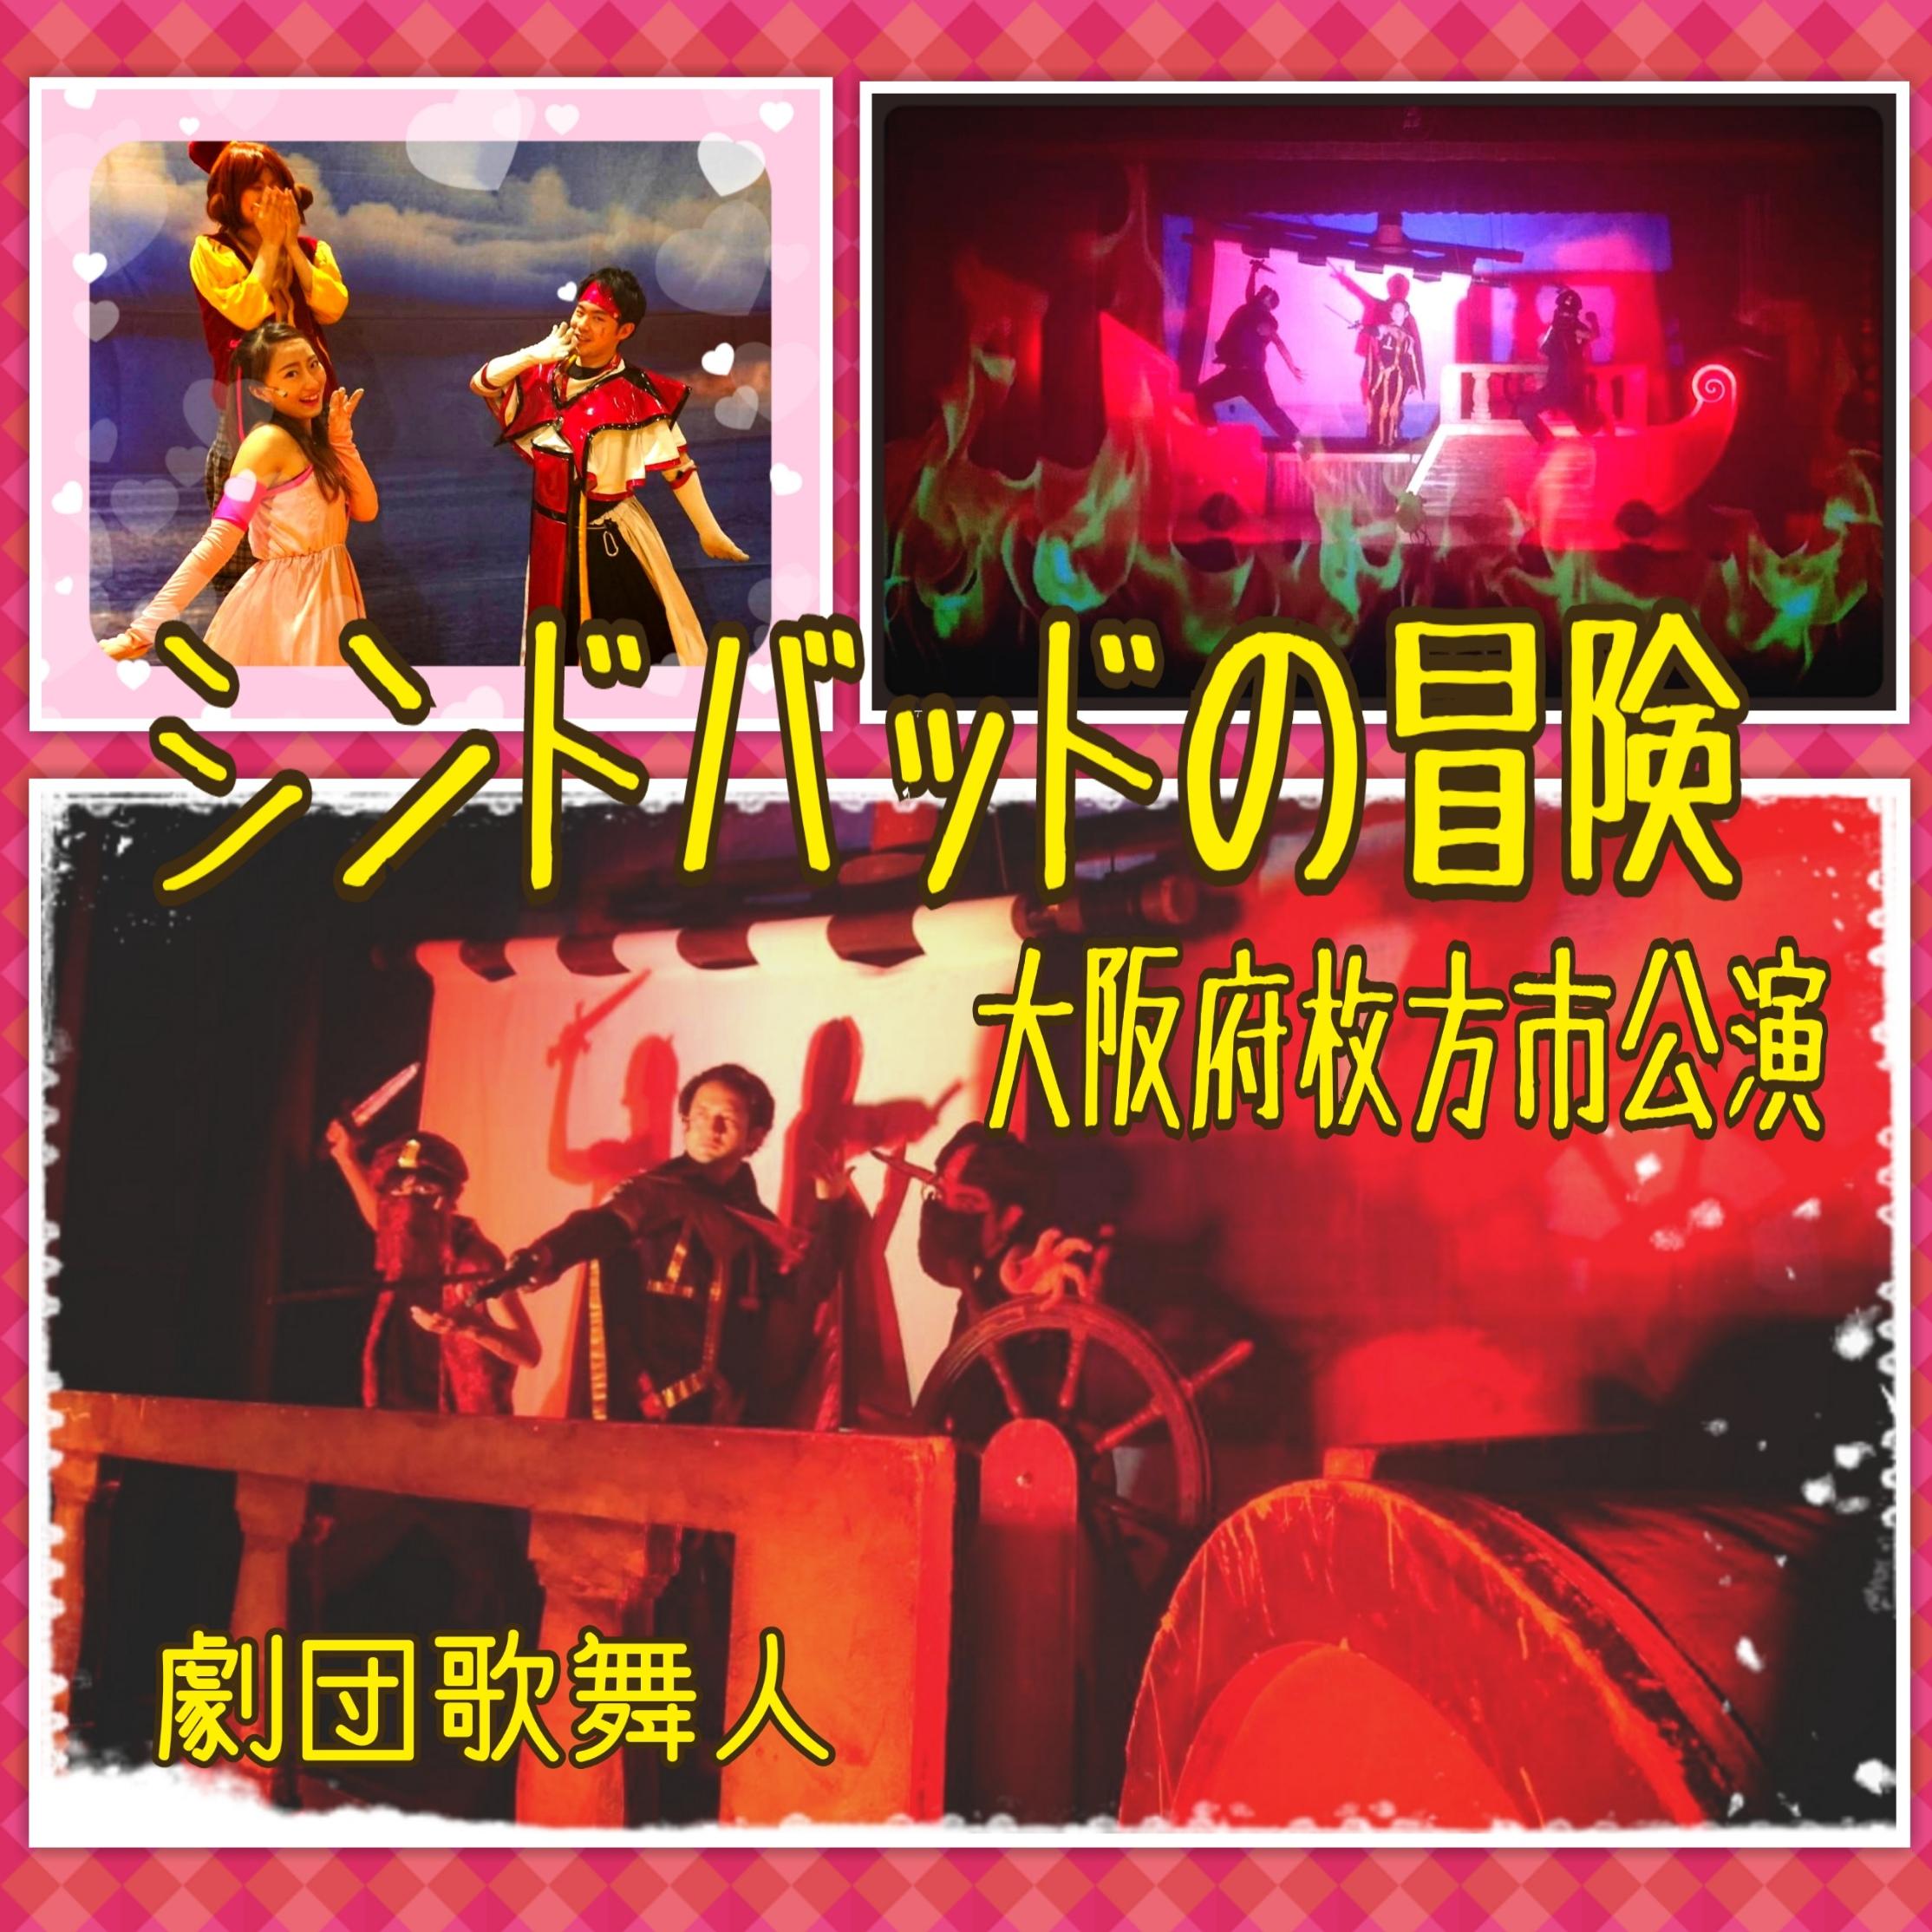 moblog_6a4437f9.jpg